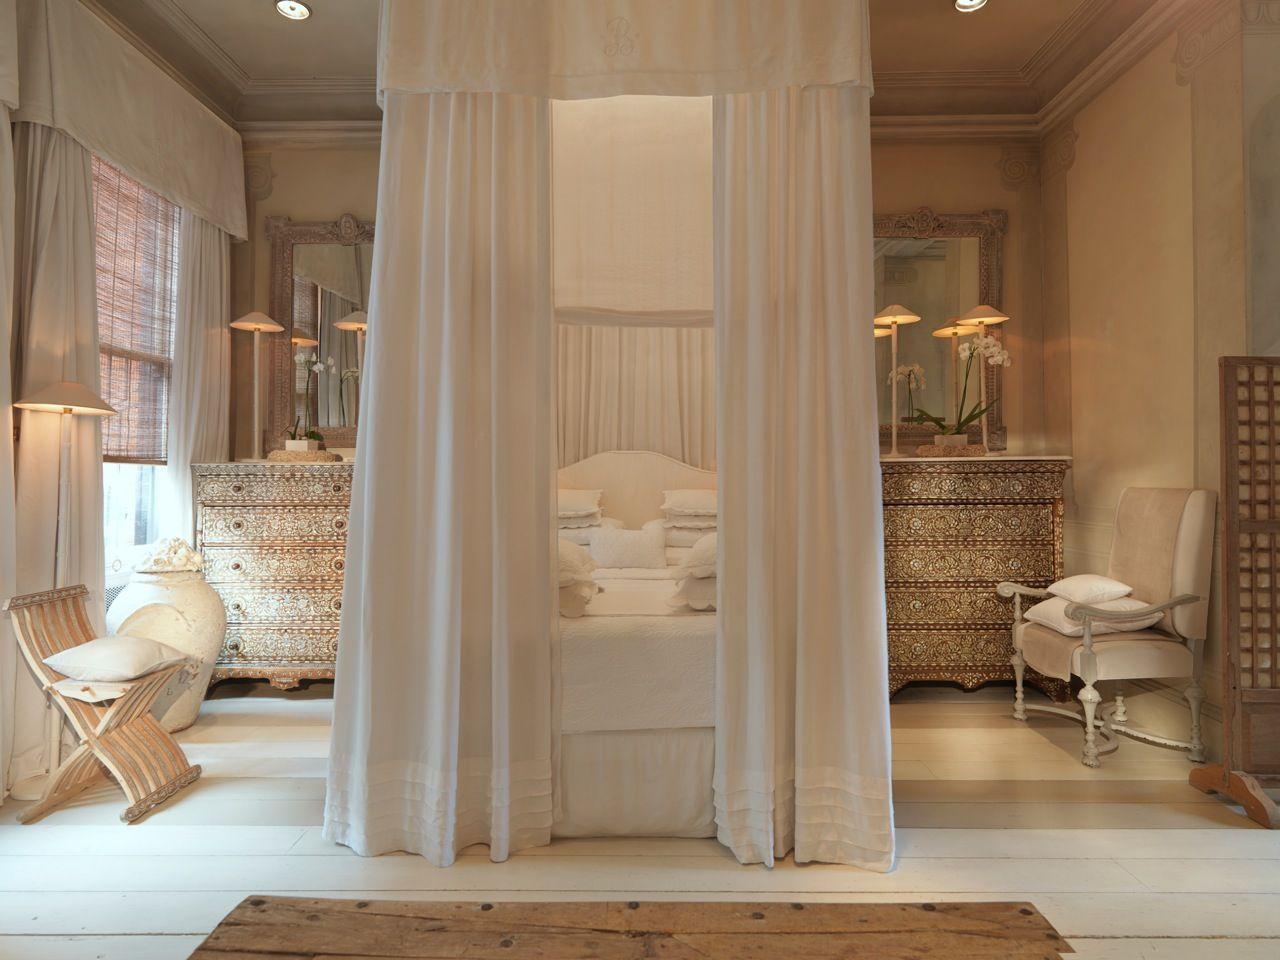 505 Corfu Suite new image  Kiwi Collection... Blakes Hotel London